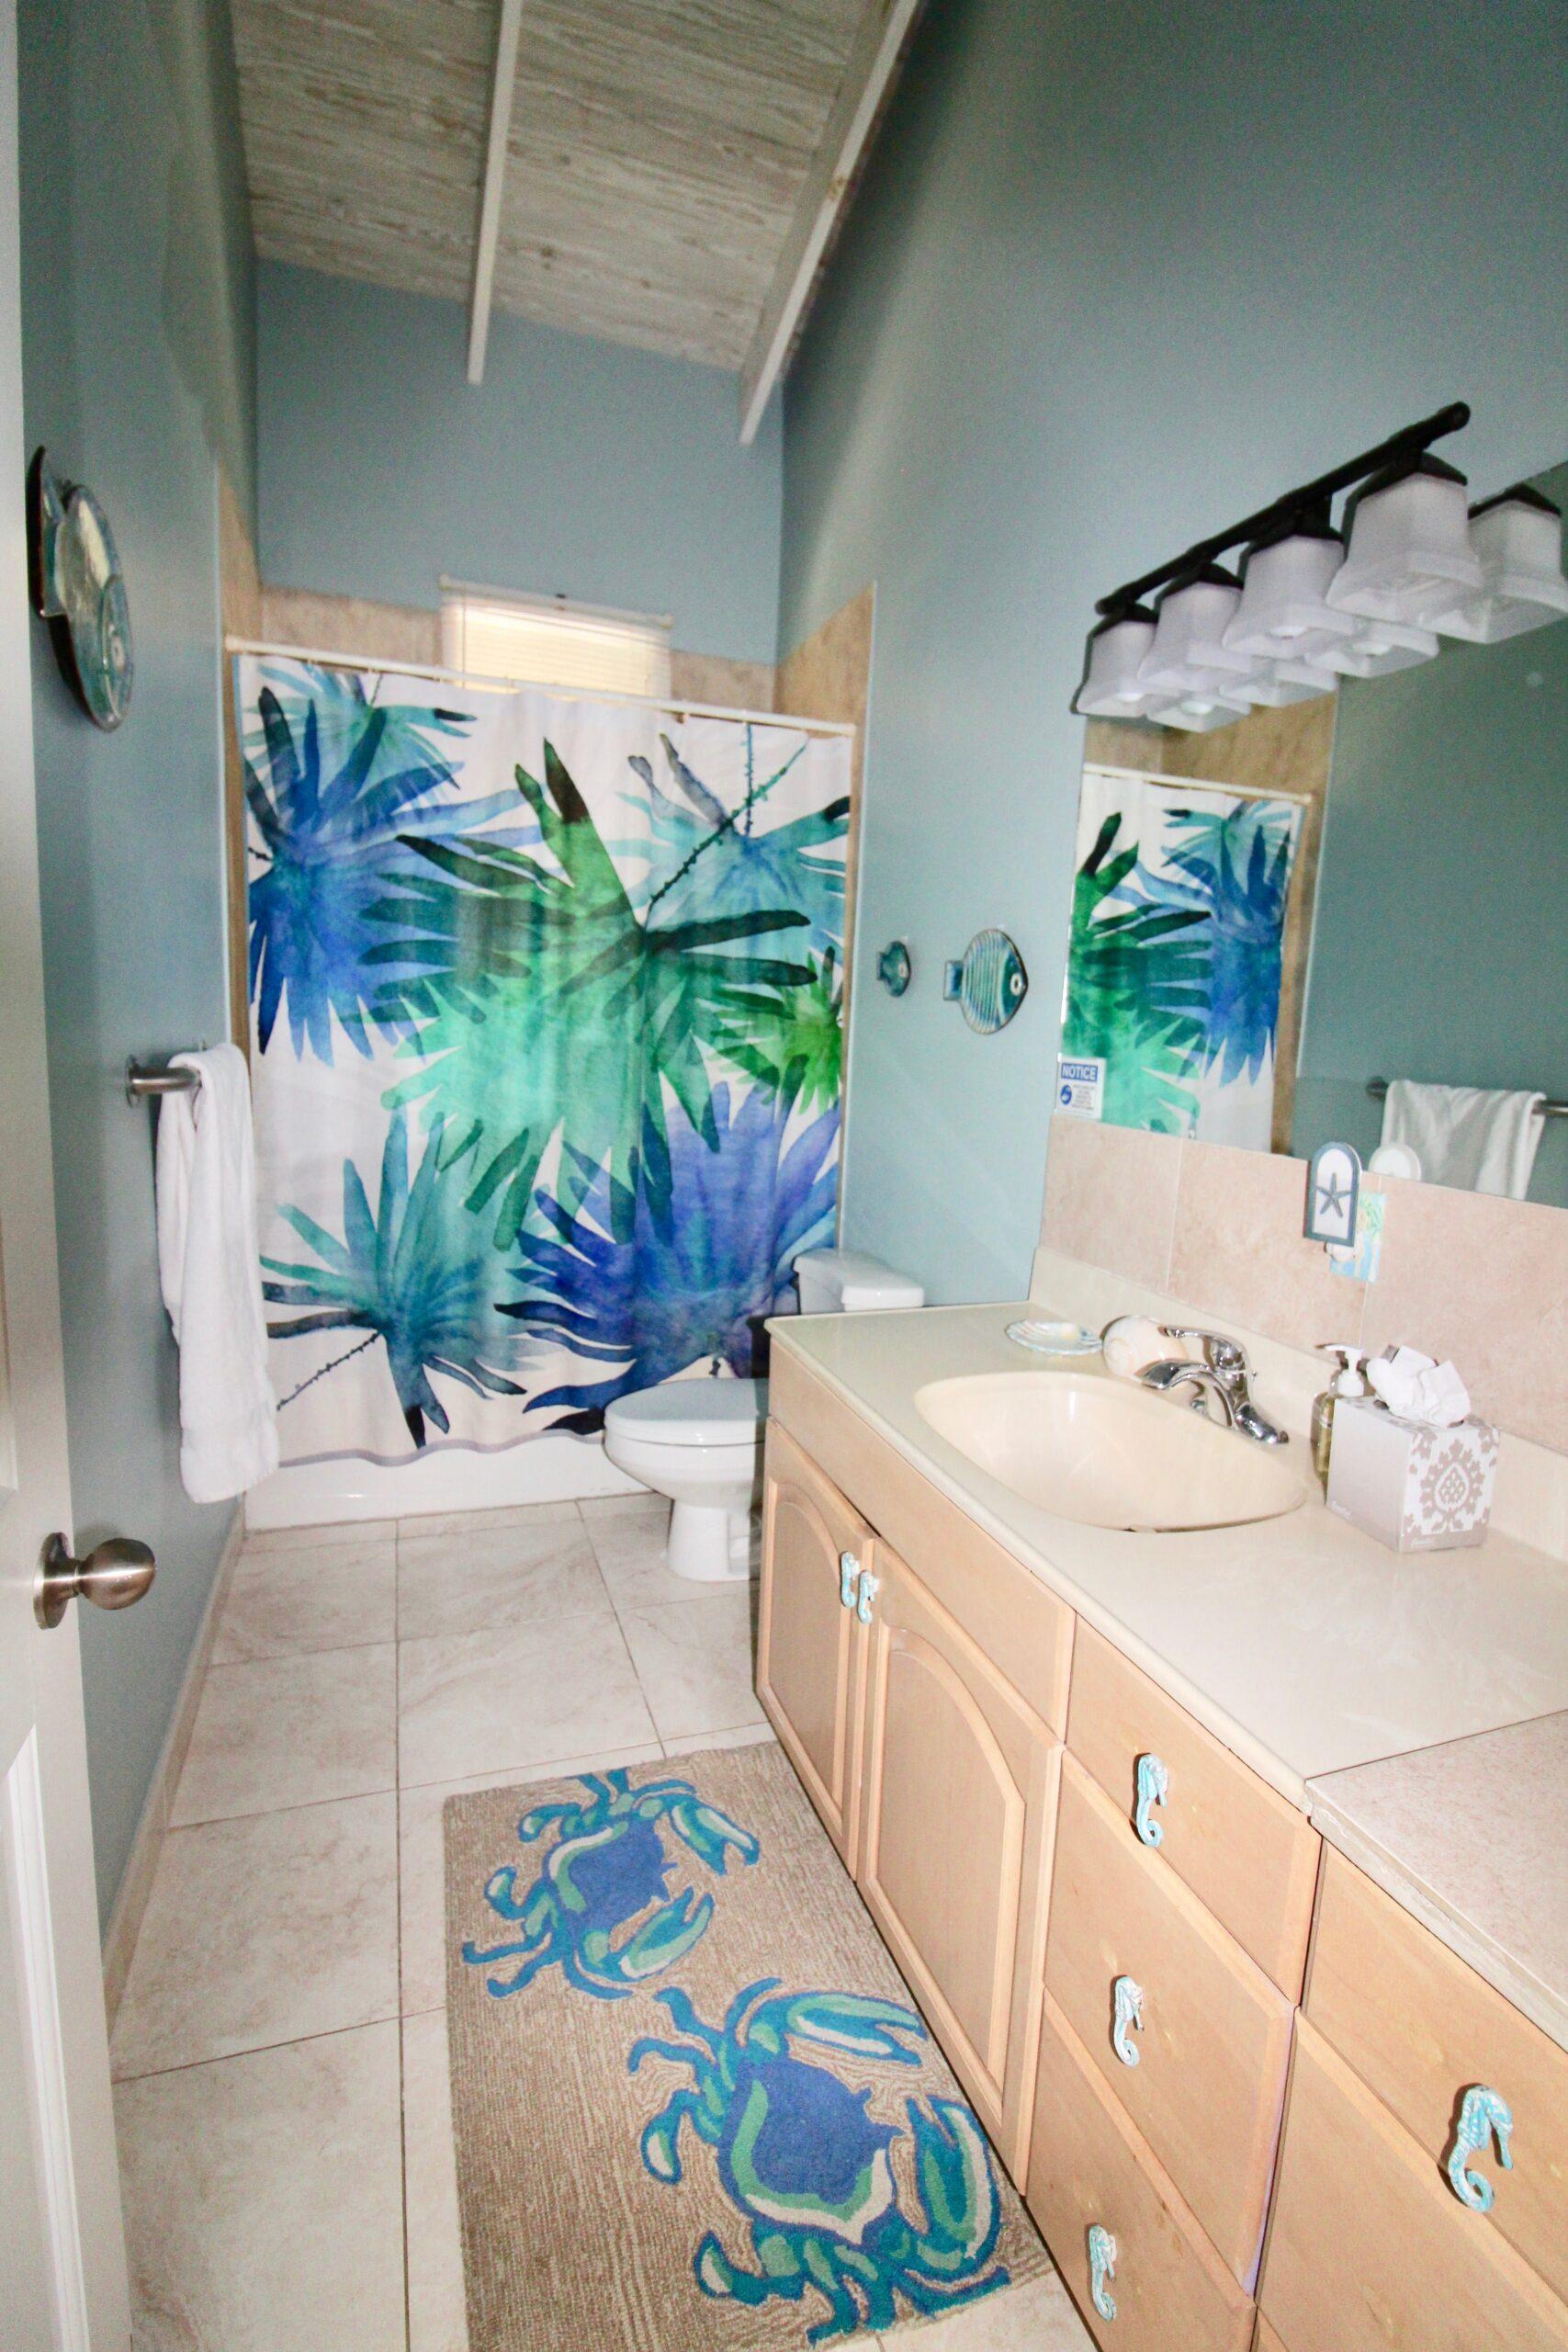 new color in small bathroom